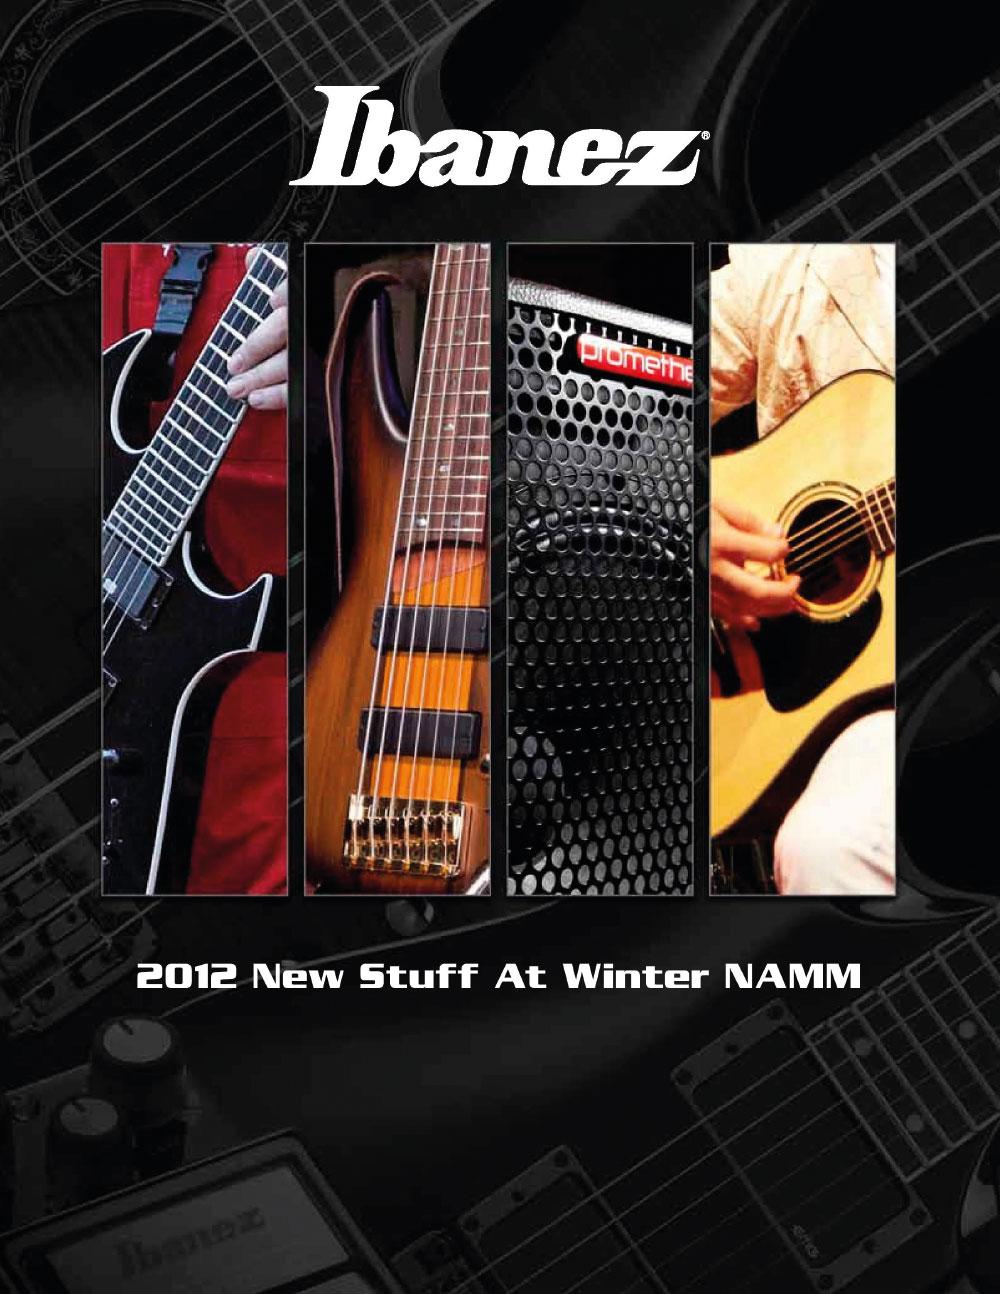 Ibanez Catalog News 2012 Winter